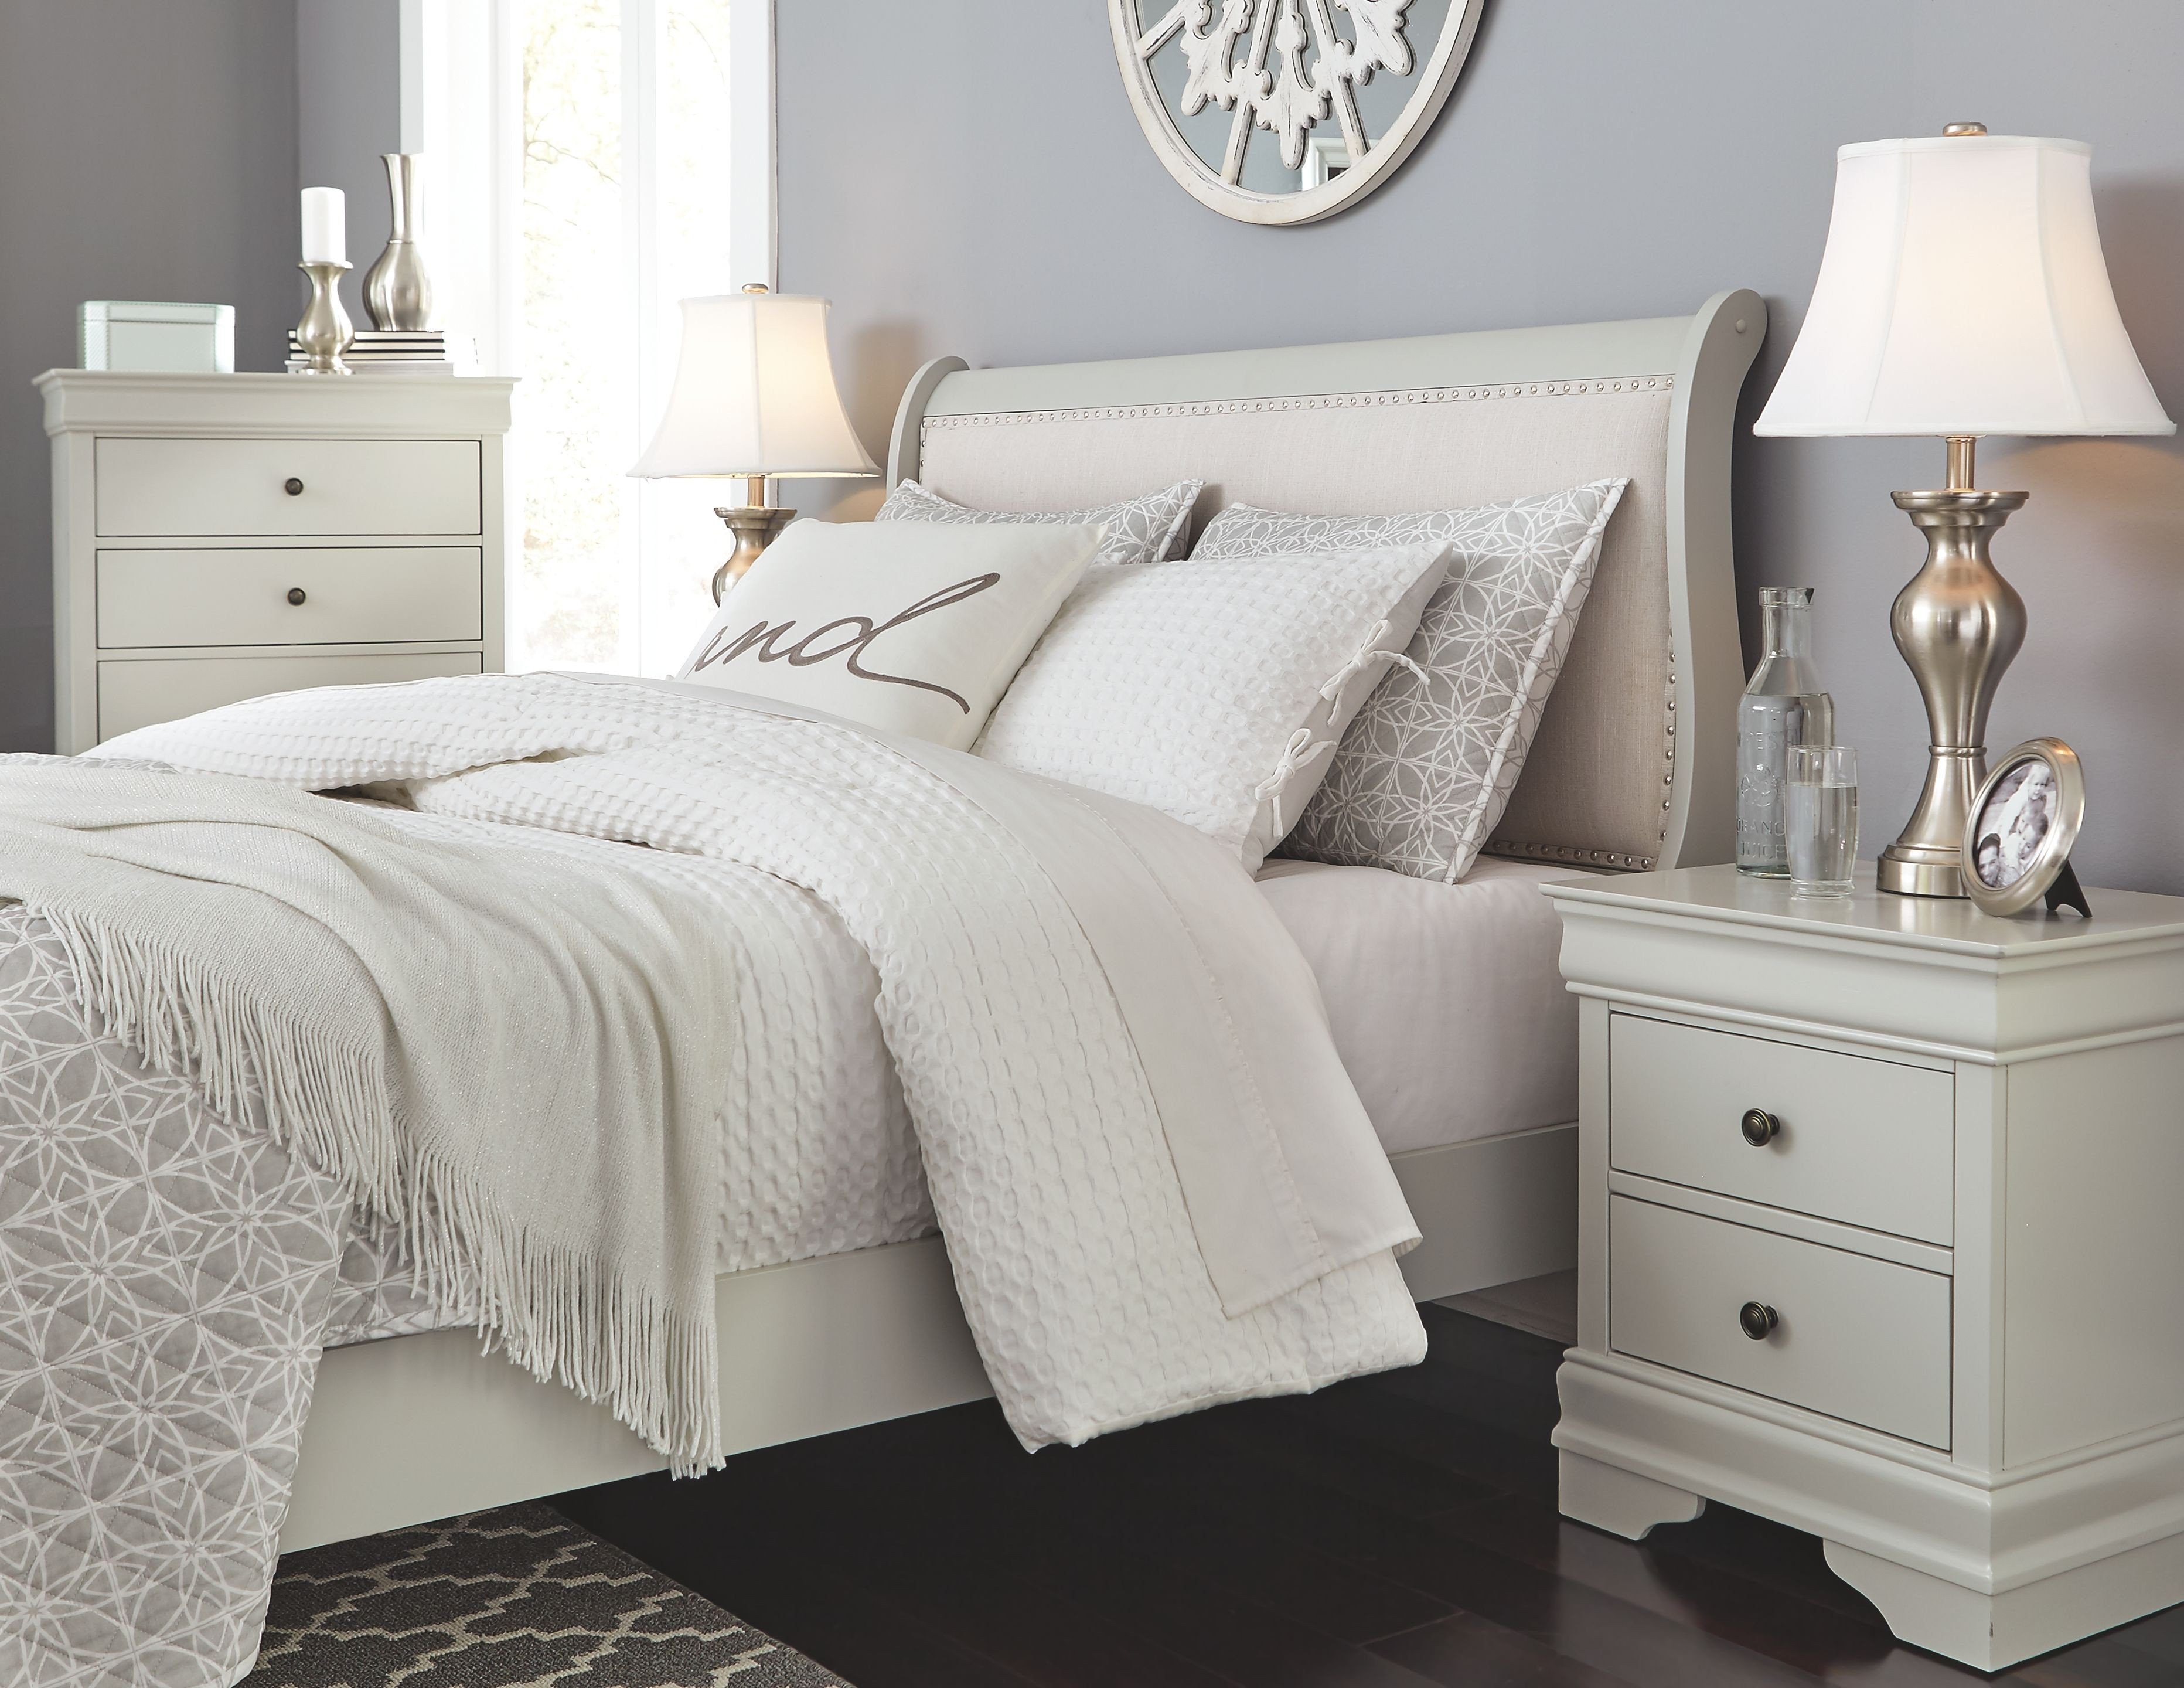 Ashley White Bedroom Set Best Of Jorstad Full Bed with 2 Nightstands Gray